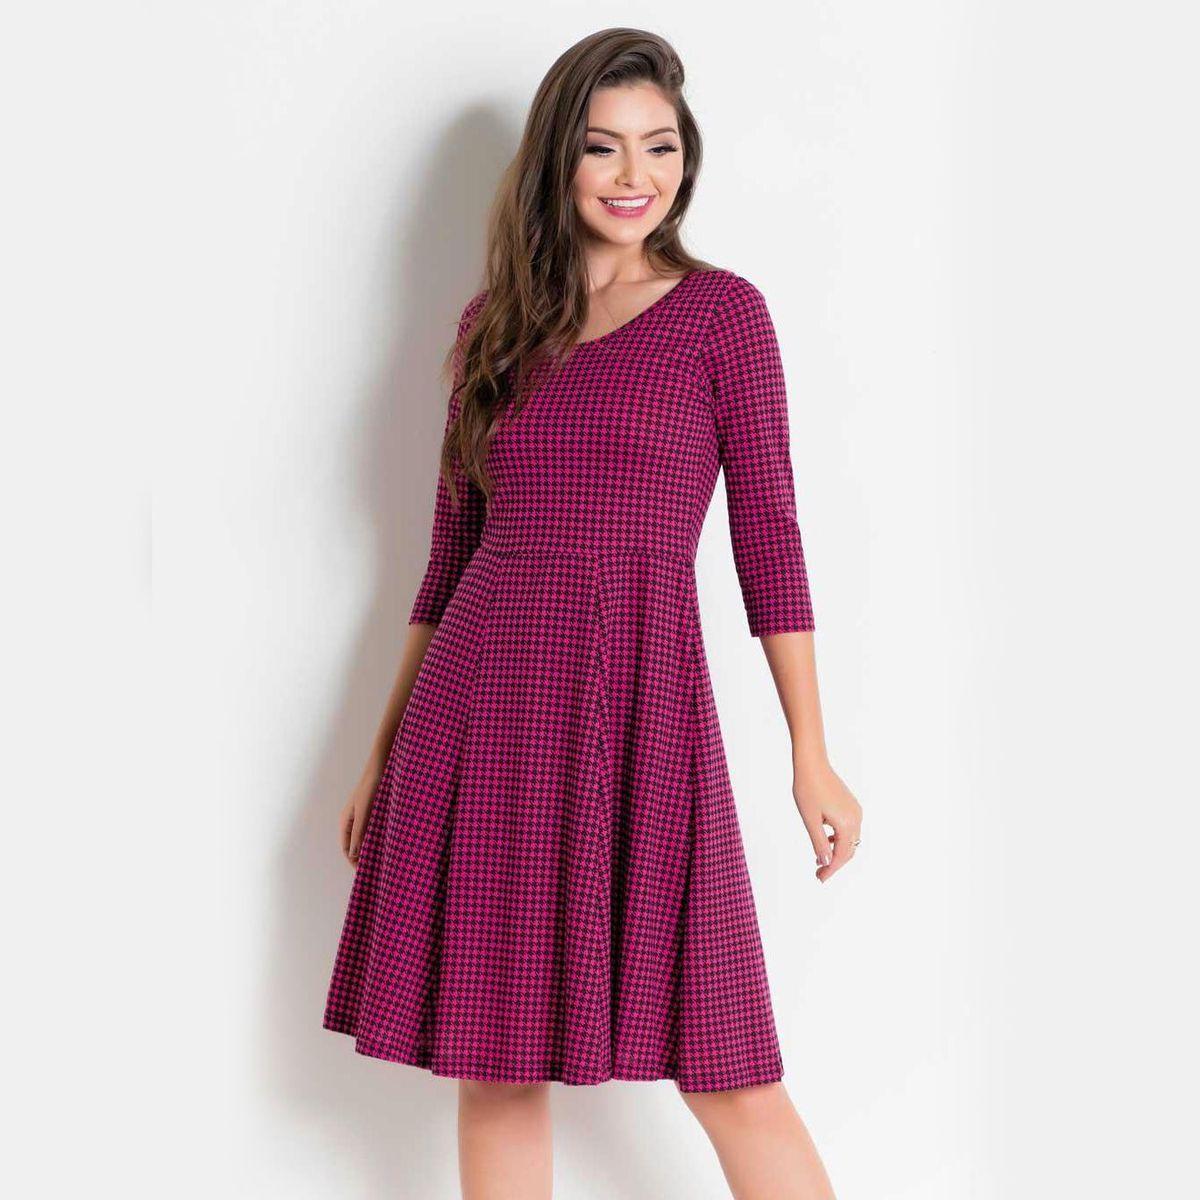 pied de poule pink - vestidos sem marca